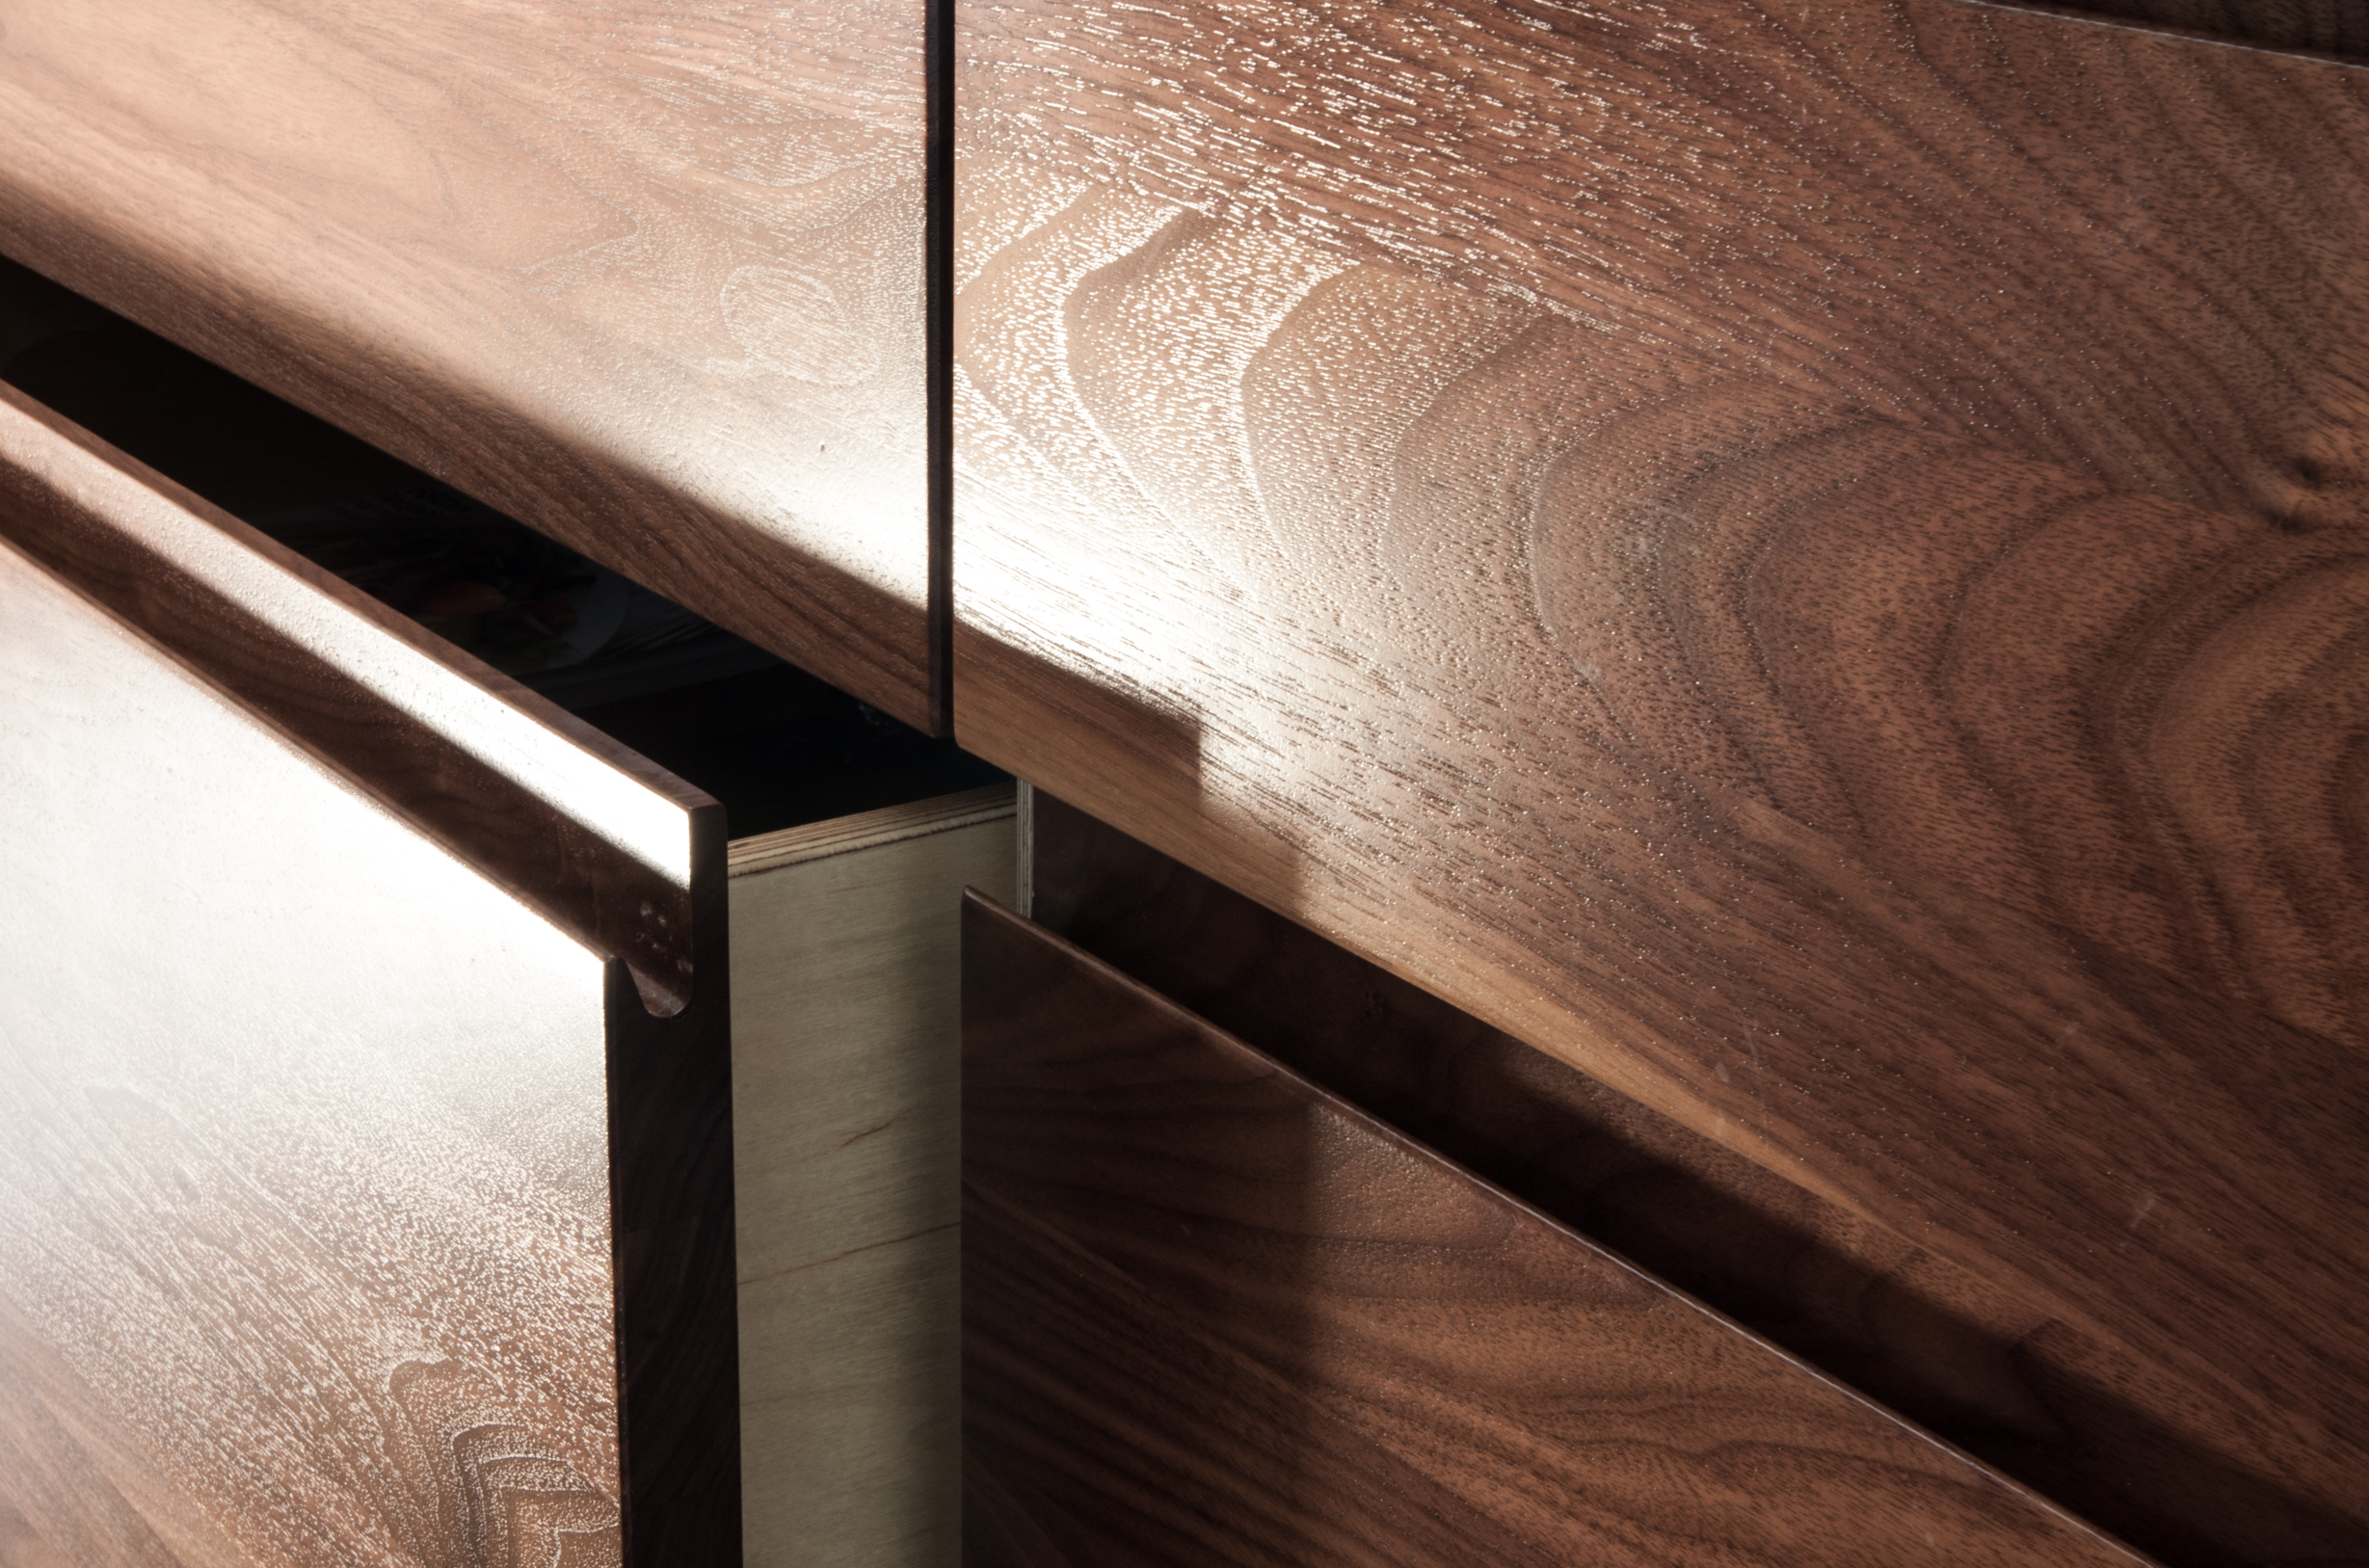 Wood drawer detail open